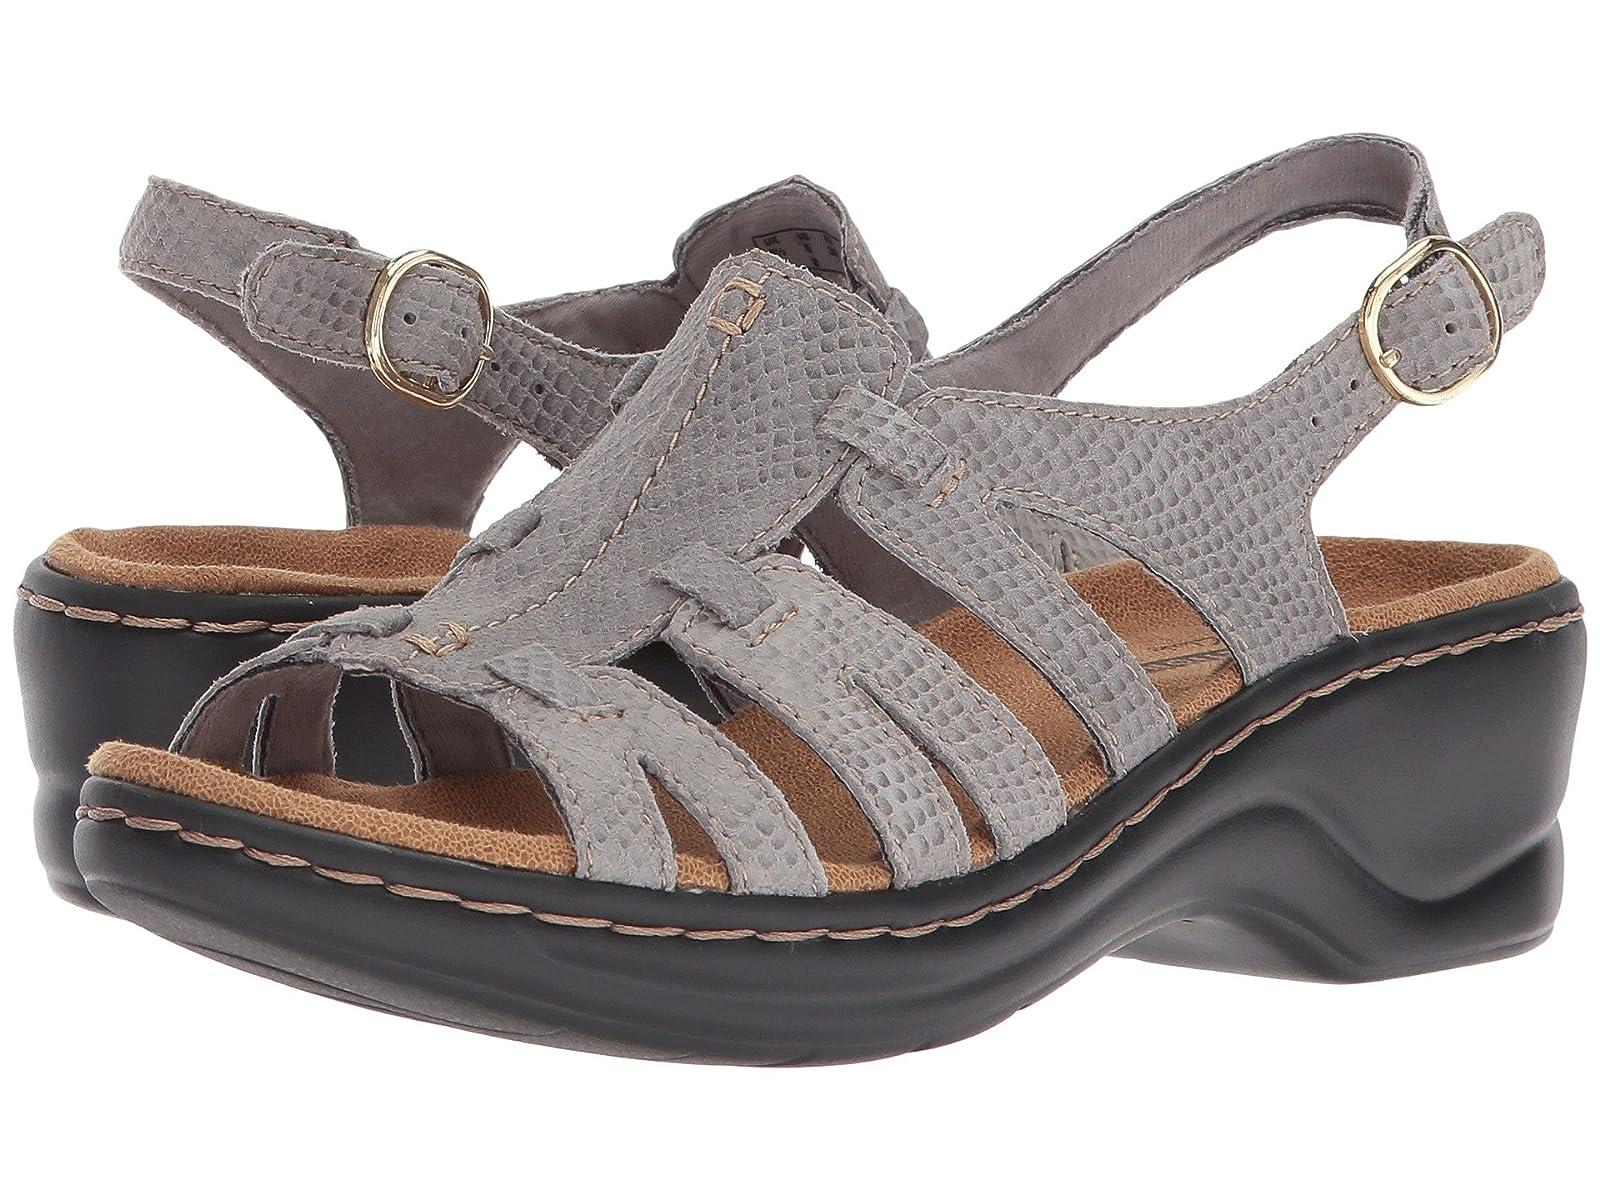 Clarks Lexi Marigold QAtmospheric grades have affordable shoes